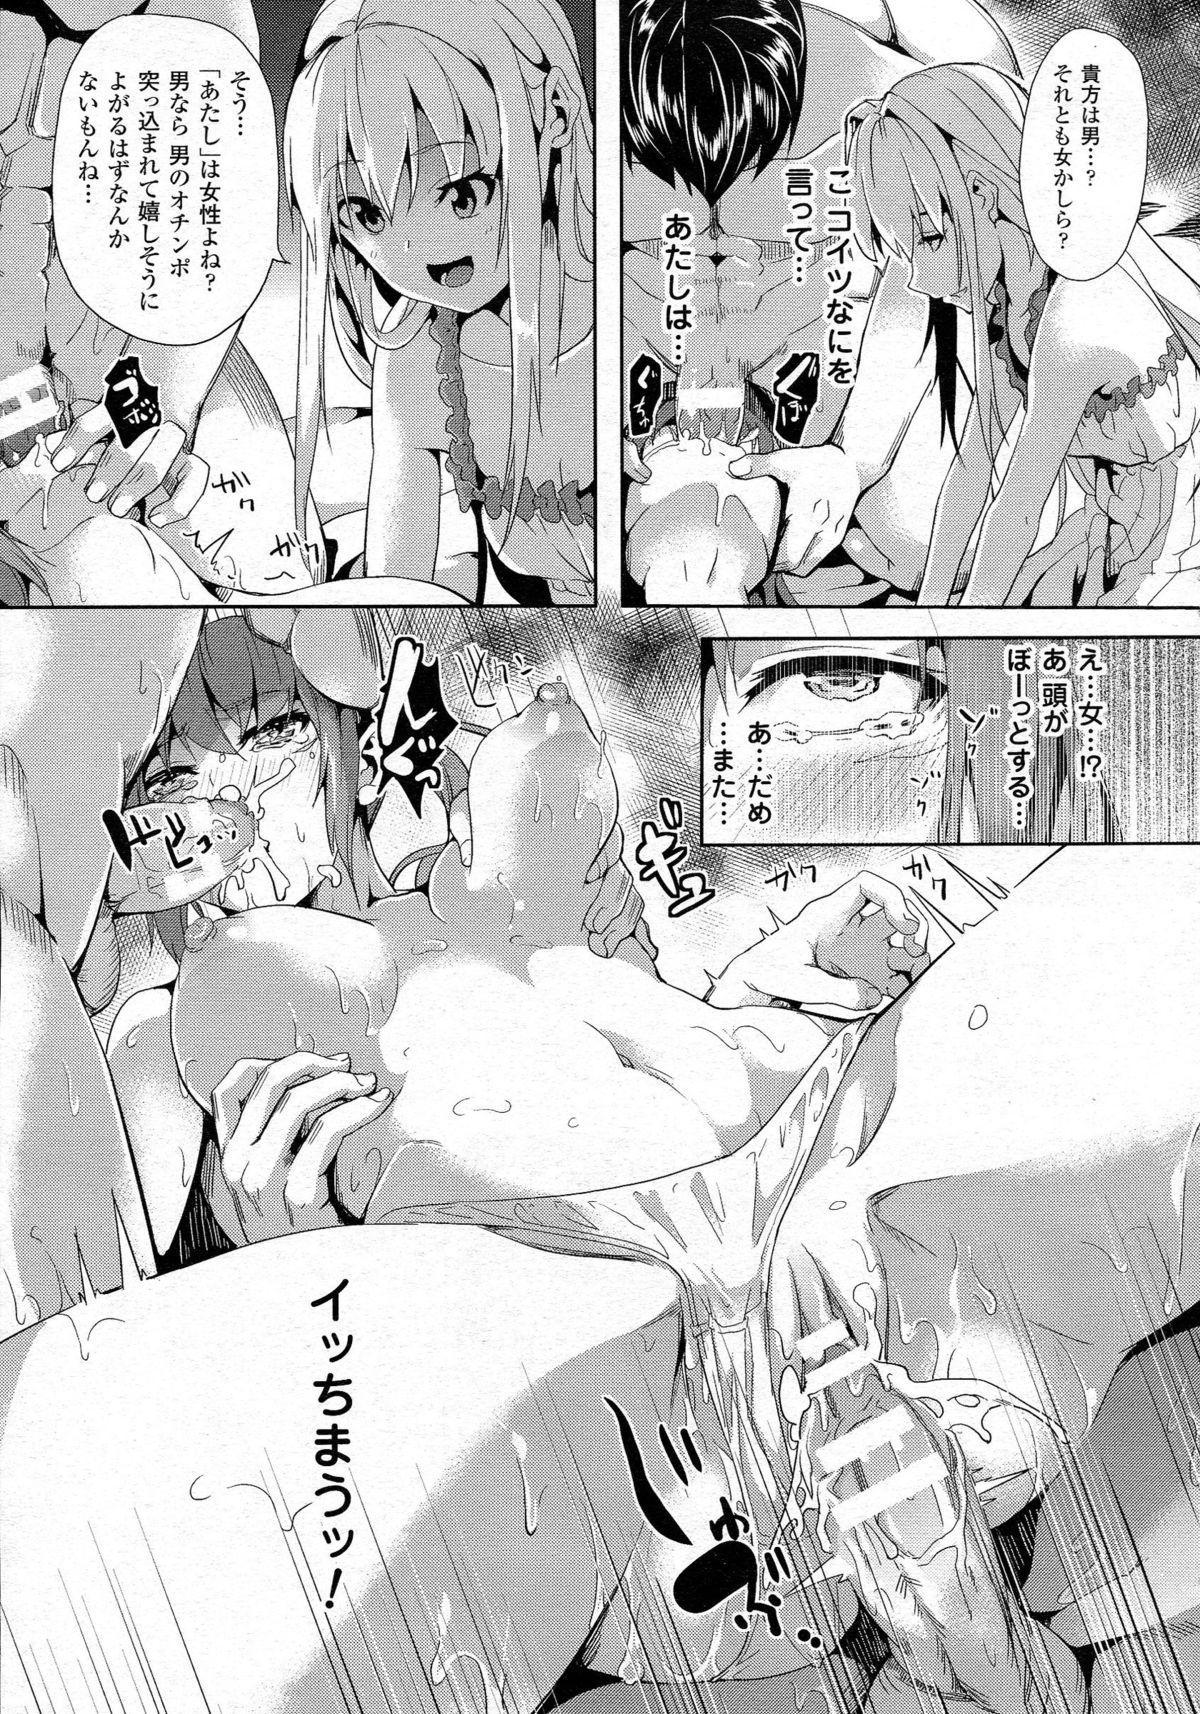 COMIC Unreal 2015-06 Vol. 55 + Hisasi Illust Shuu 79